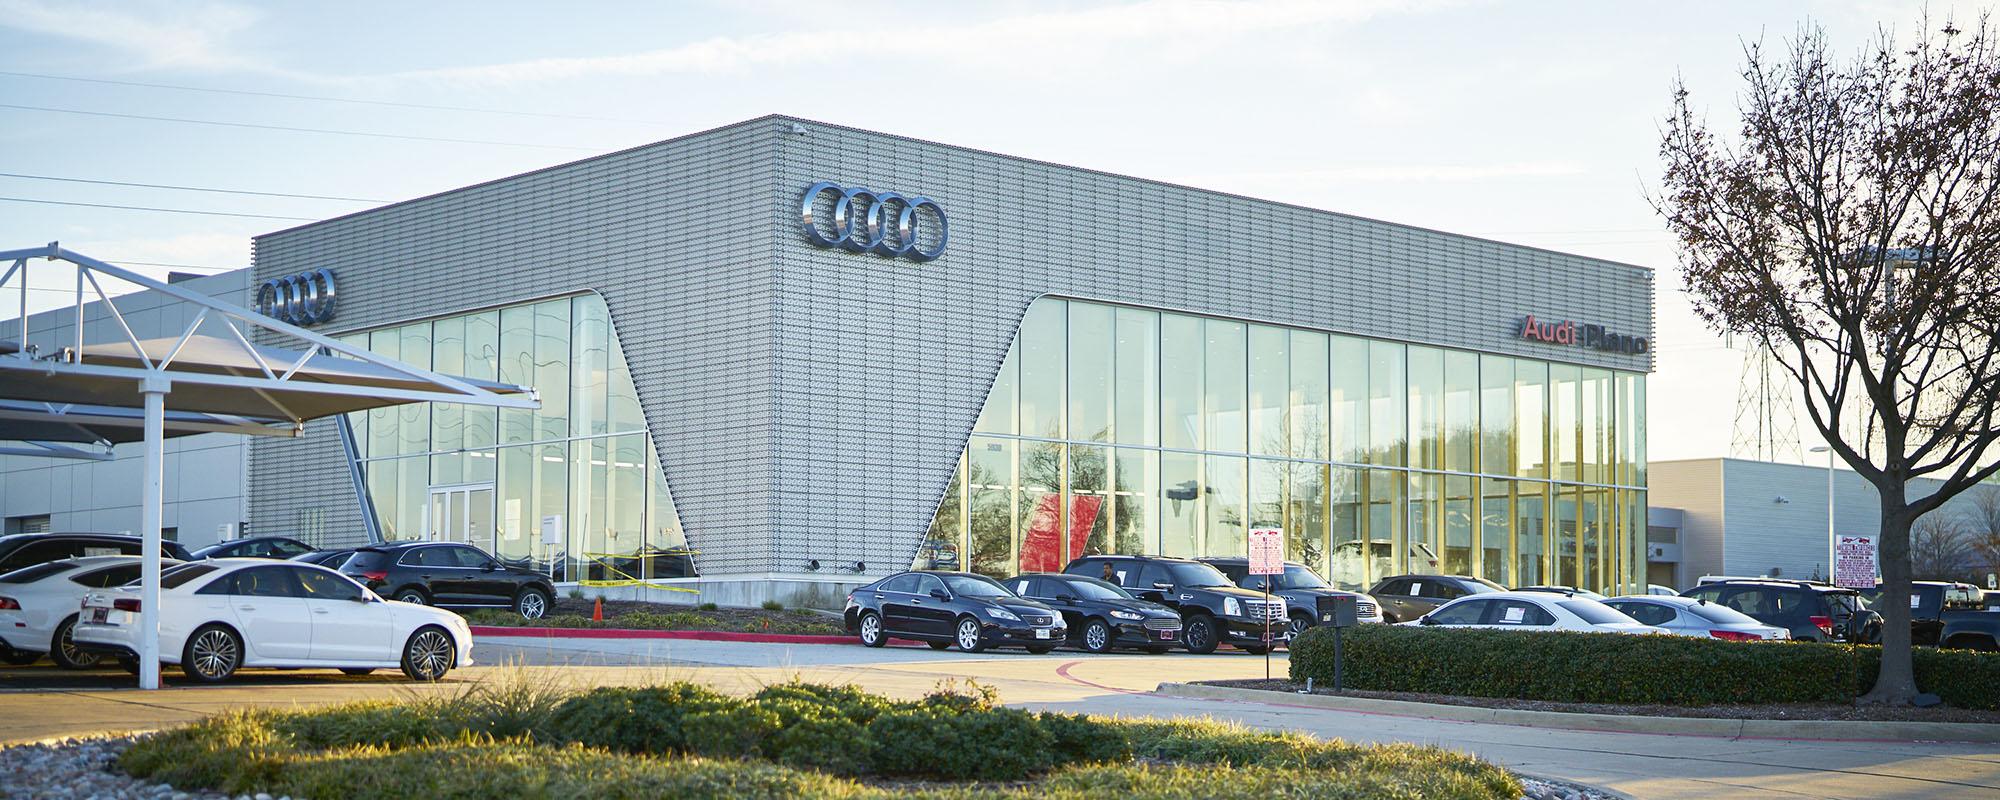 Audi Dealership Near Me >> Audi Dealership Newsglobenewsglobe